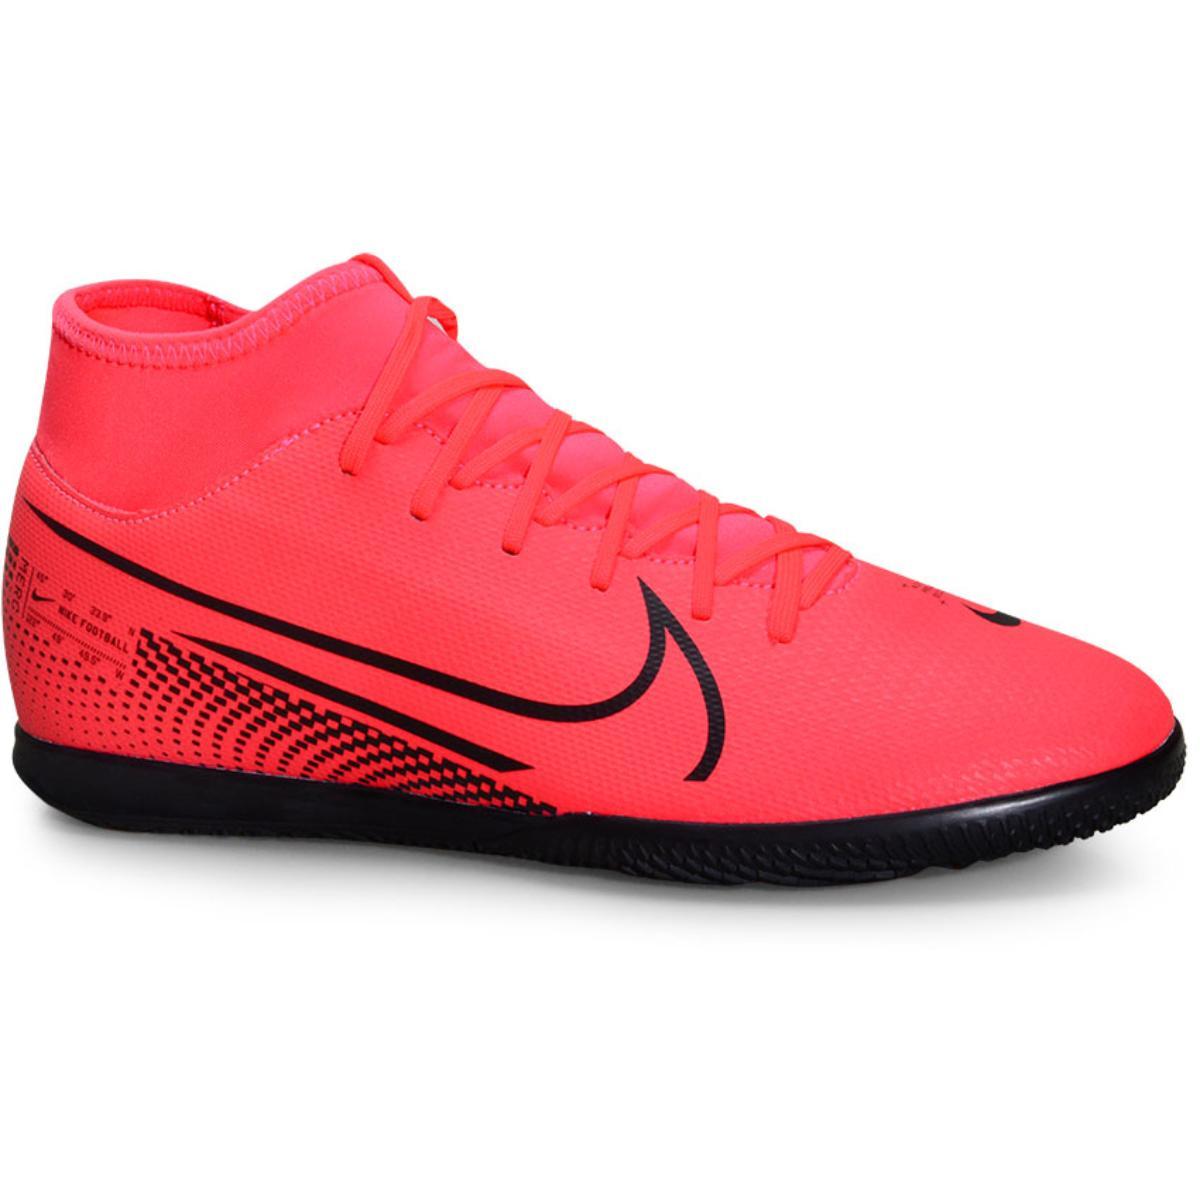 Tênis Masculino Nike At7979-606 Mercurial Superfly 7 Club ic Coral/preto